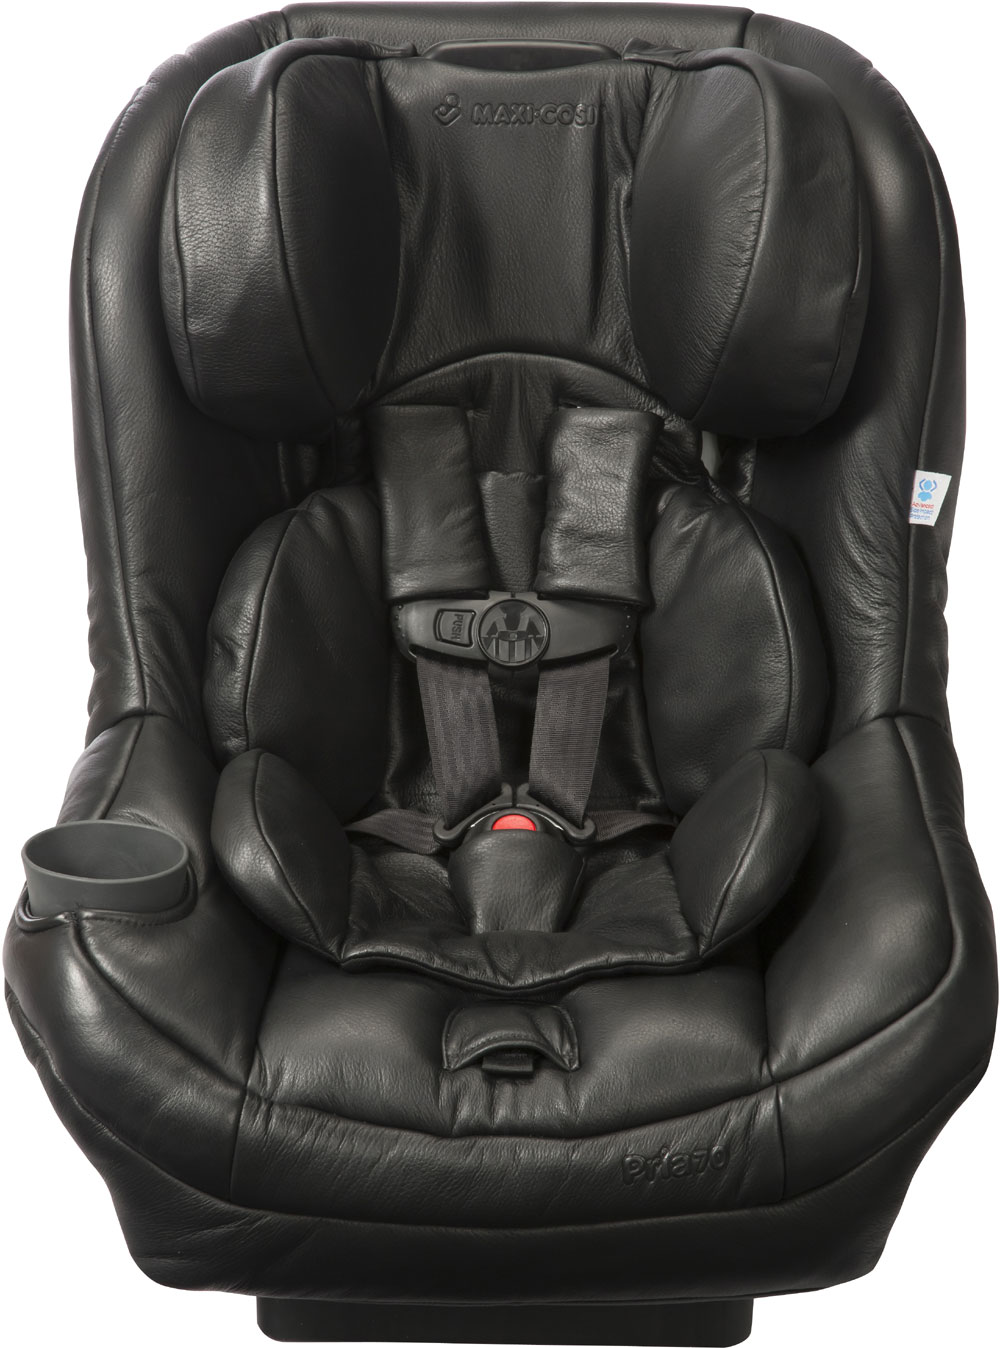 Maxi Cosi Priori Convertible Car Seats